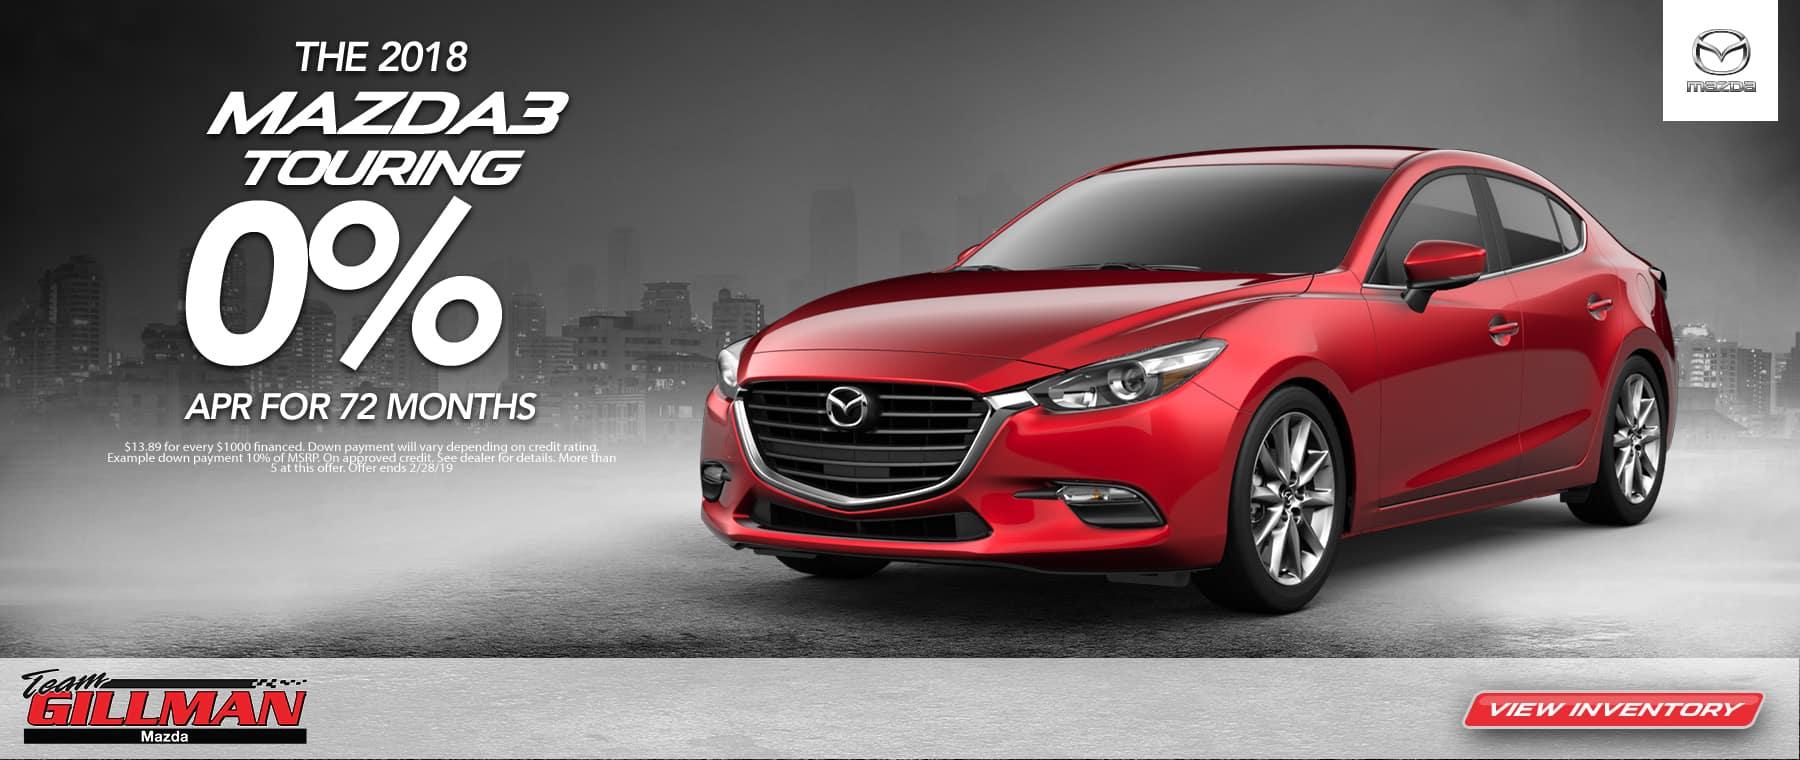 2018-Mazda3-Touring